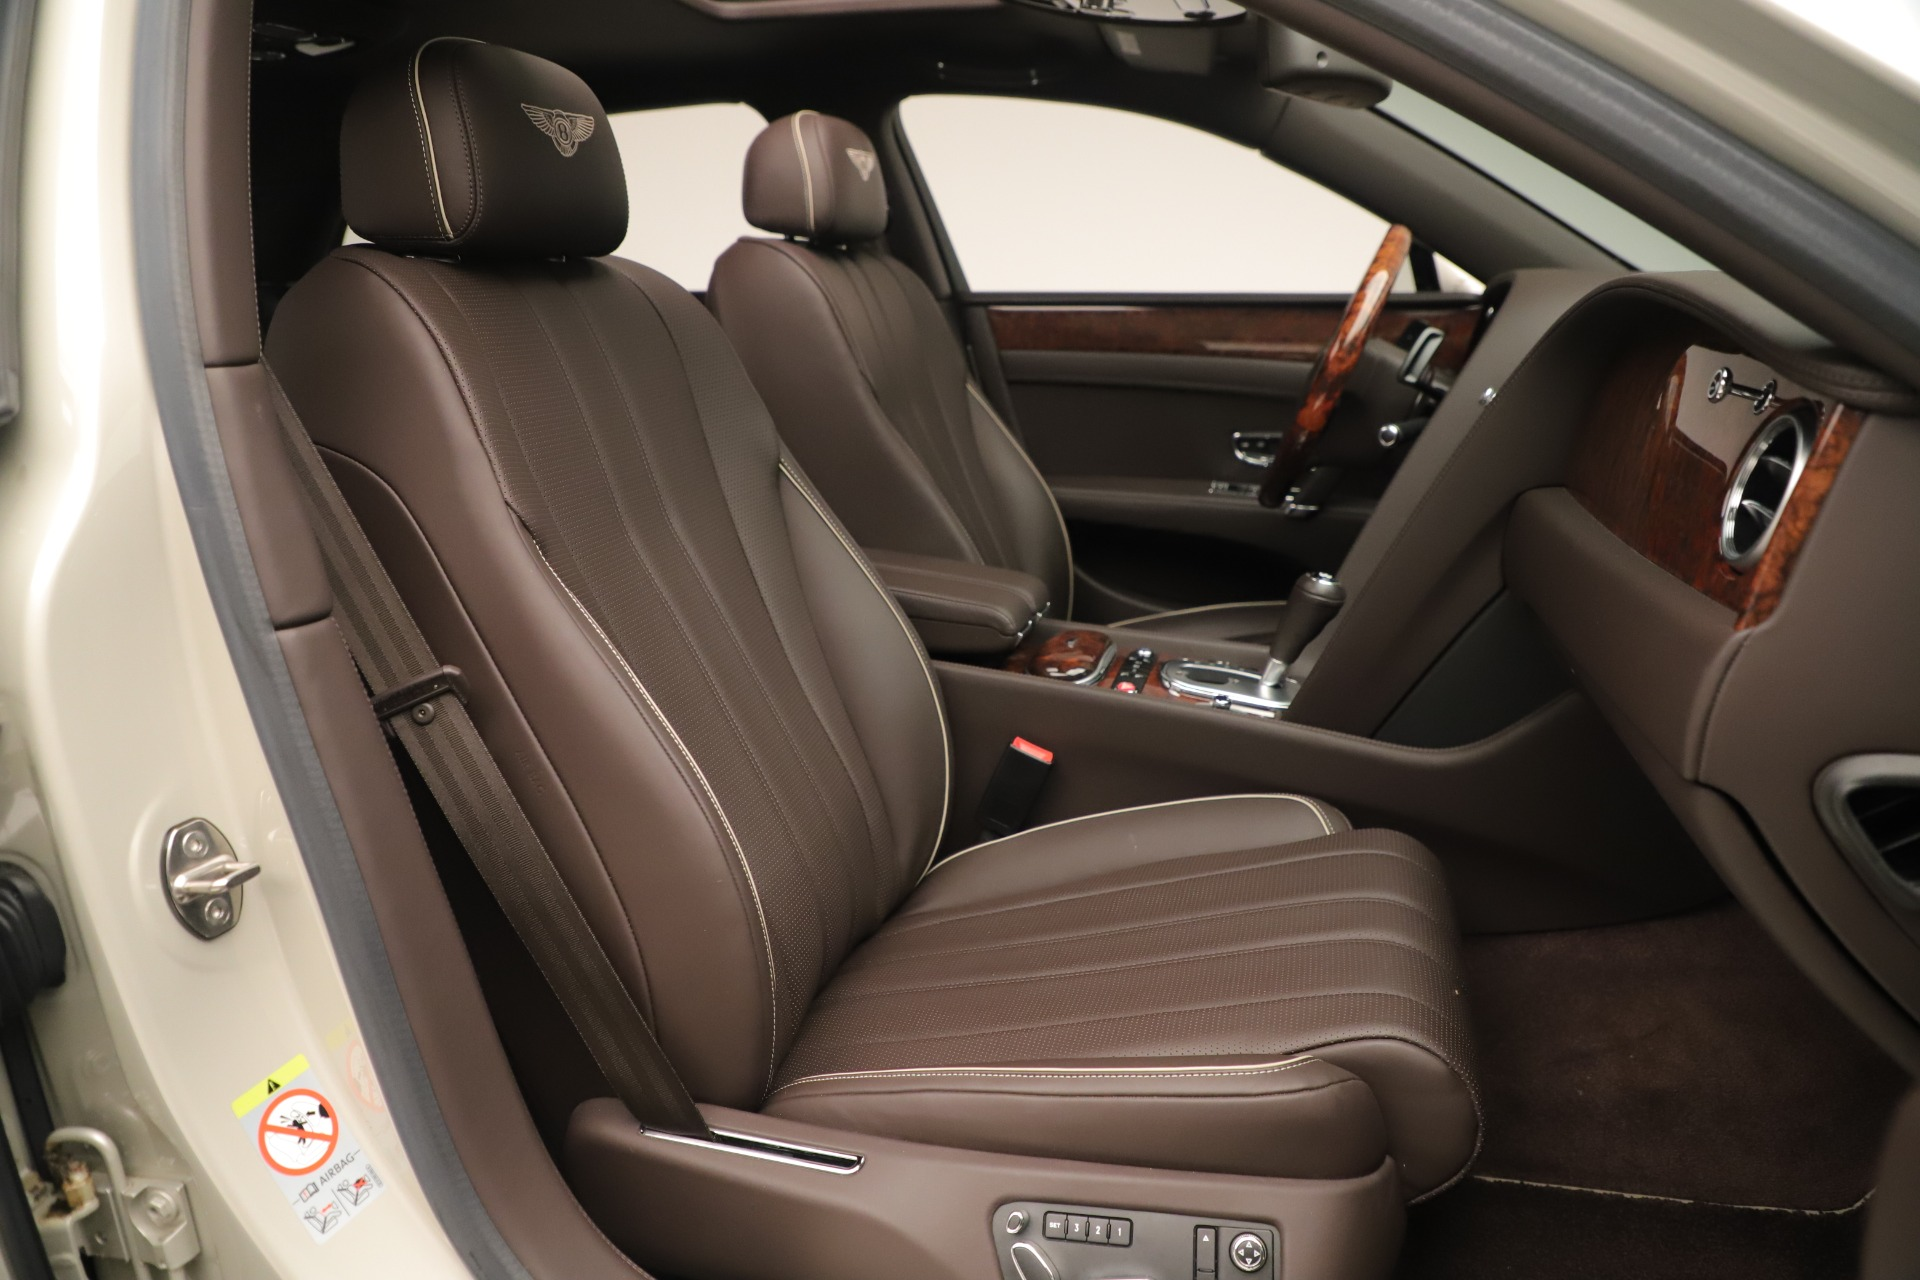 Used 2015 Bentley Flying Spur V8 For Sale In Westport, CT 3444_p26